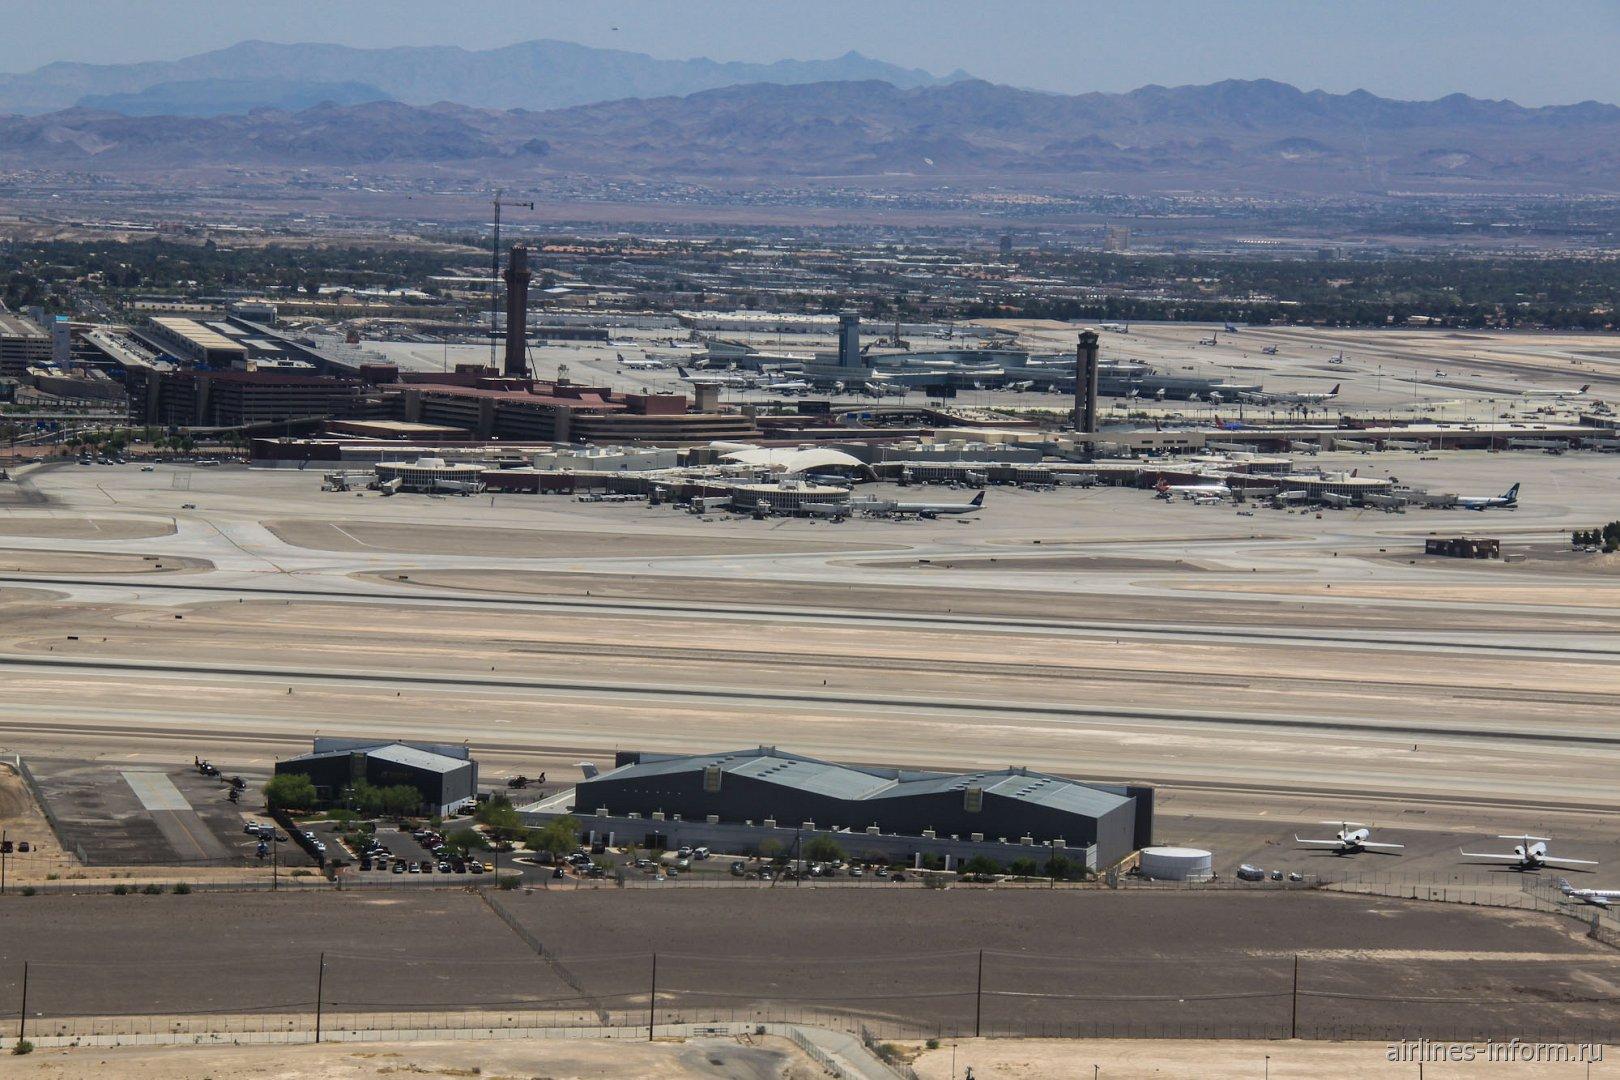 Аэропорт Лас-Вегас Мак-Каран